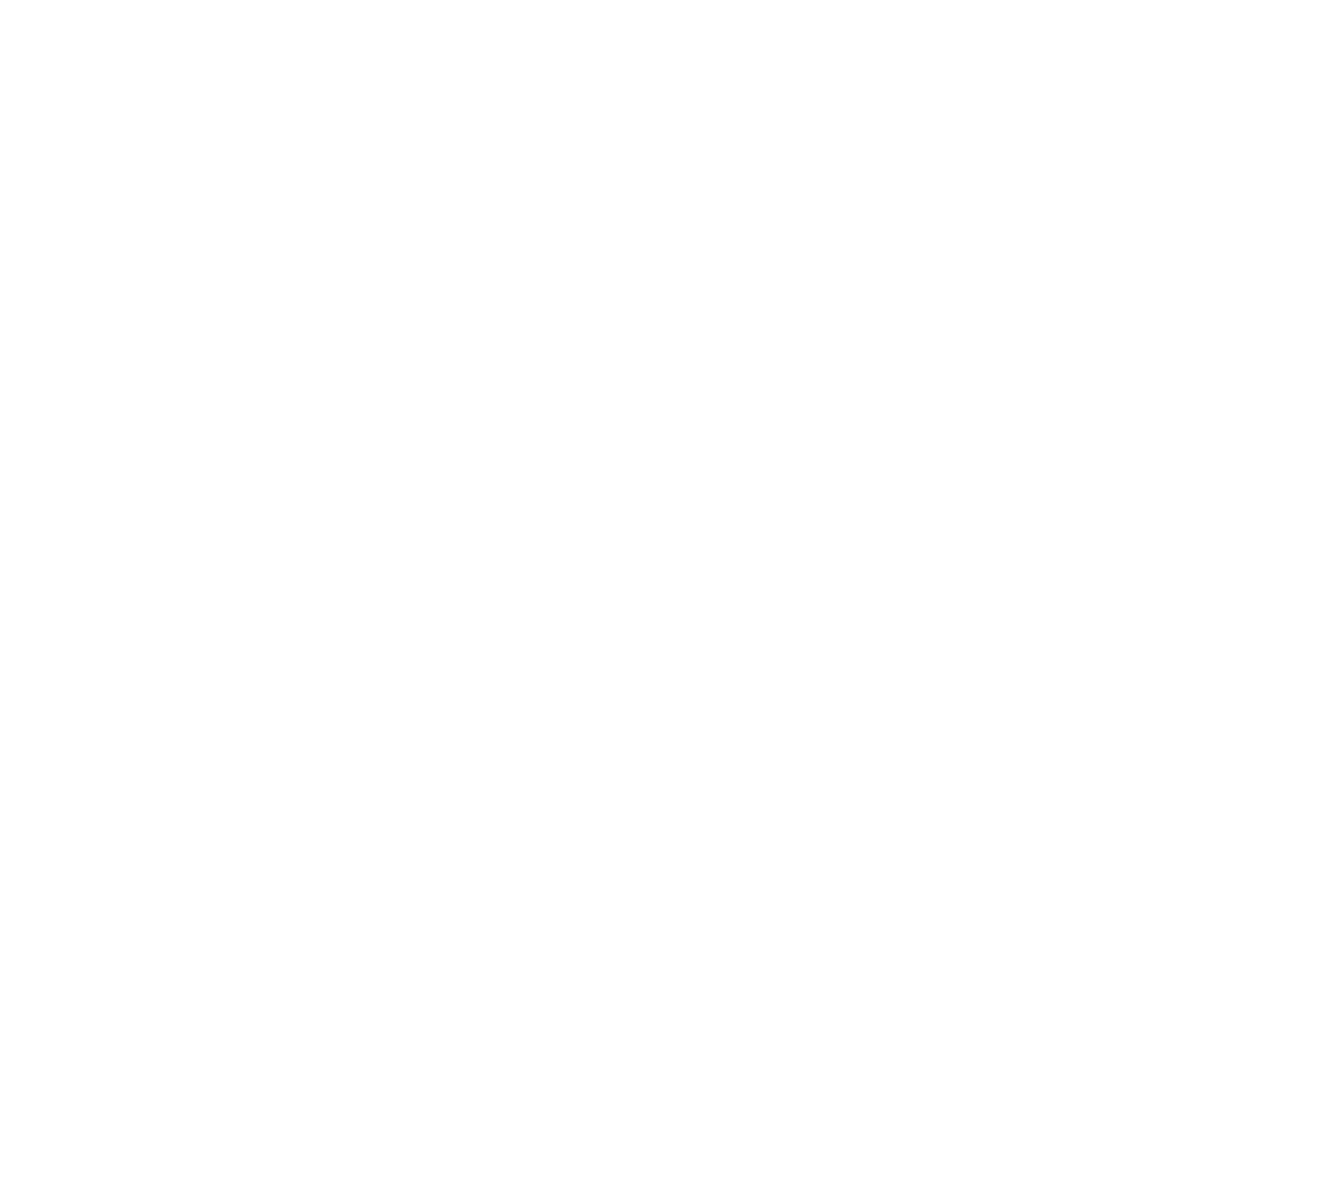 BBQBASH-2017